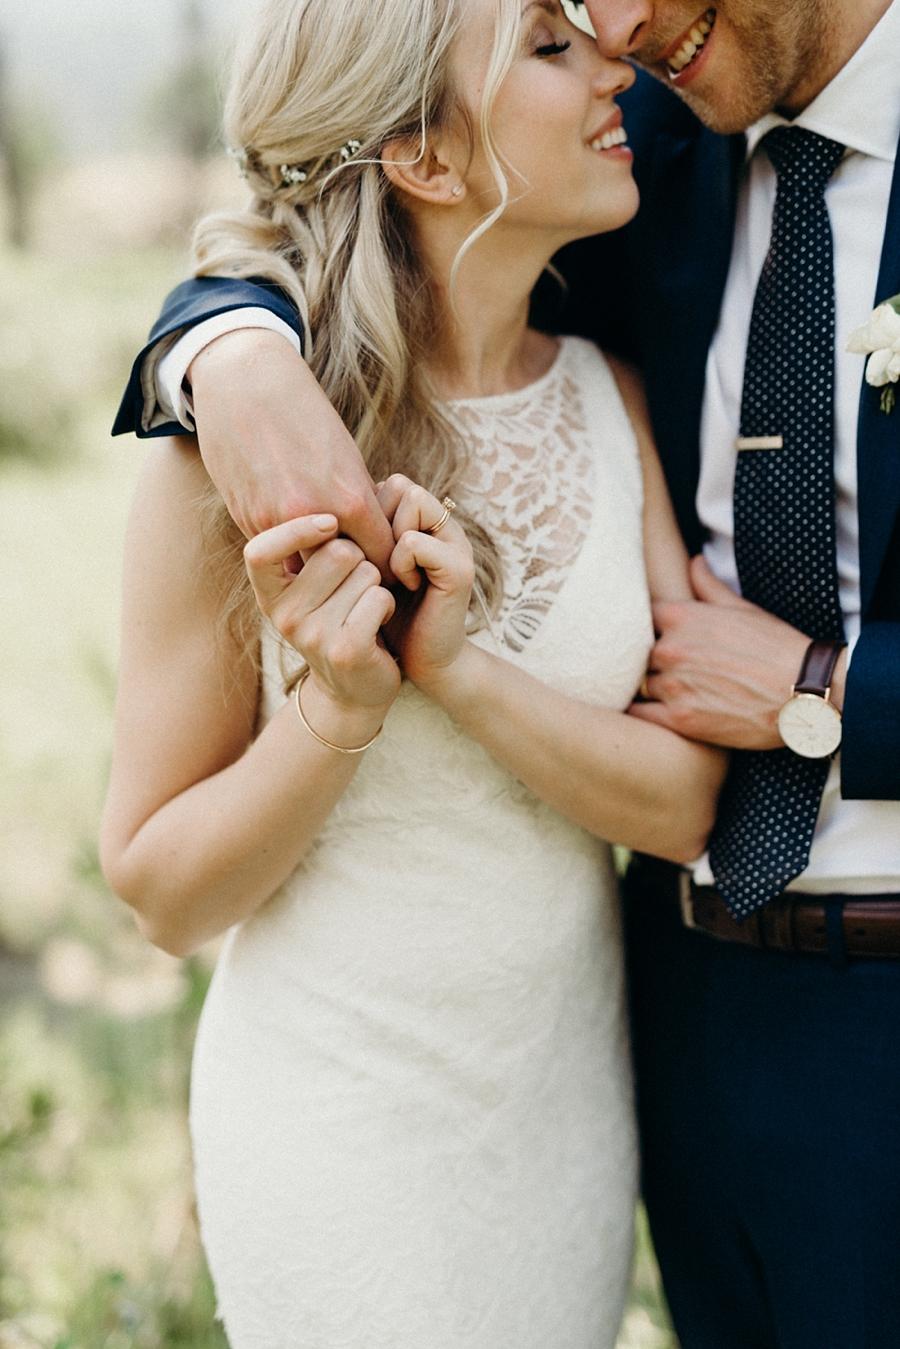 kaihla_tonai_intimate_wedding_elopement_photographer_7246.jpg